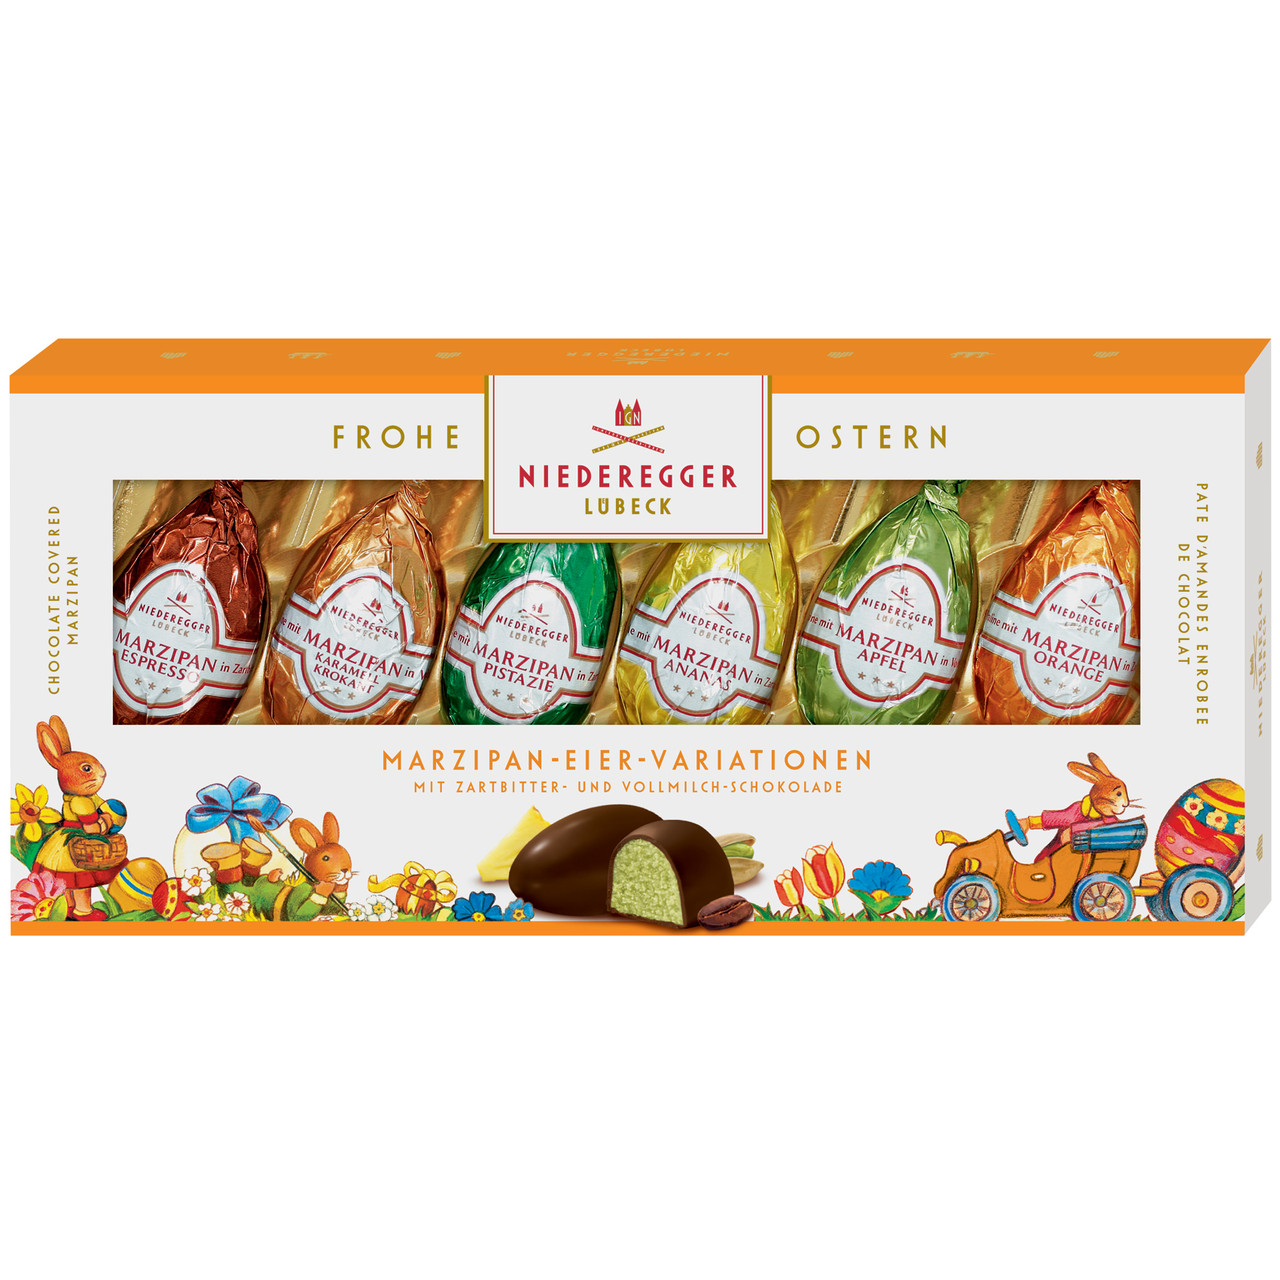 Марципан Niederegger Lubeck Marzipan Eier Variationen 100 g